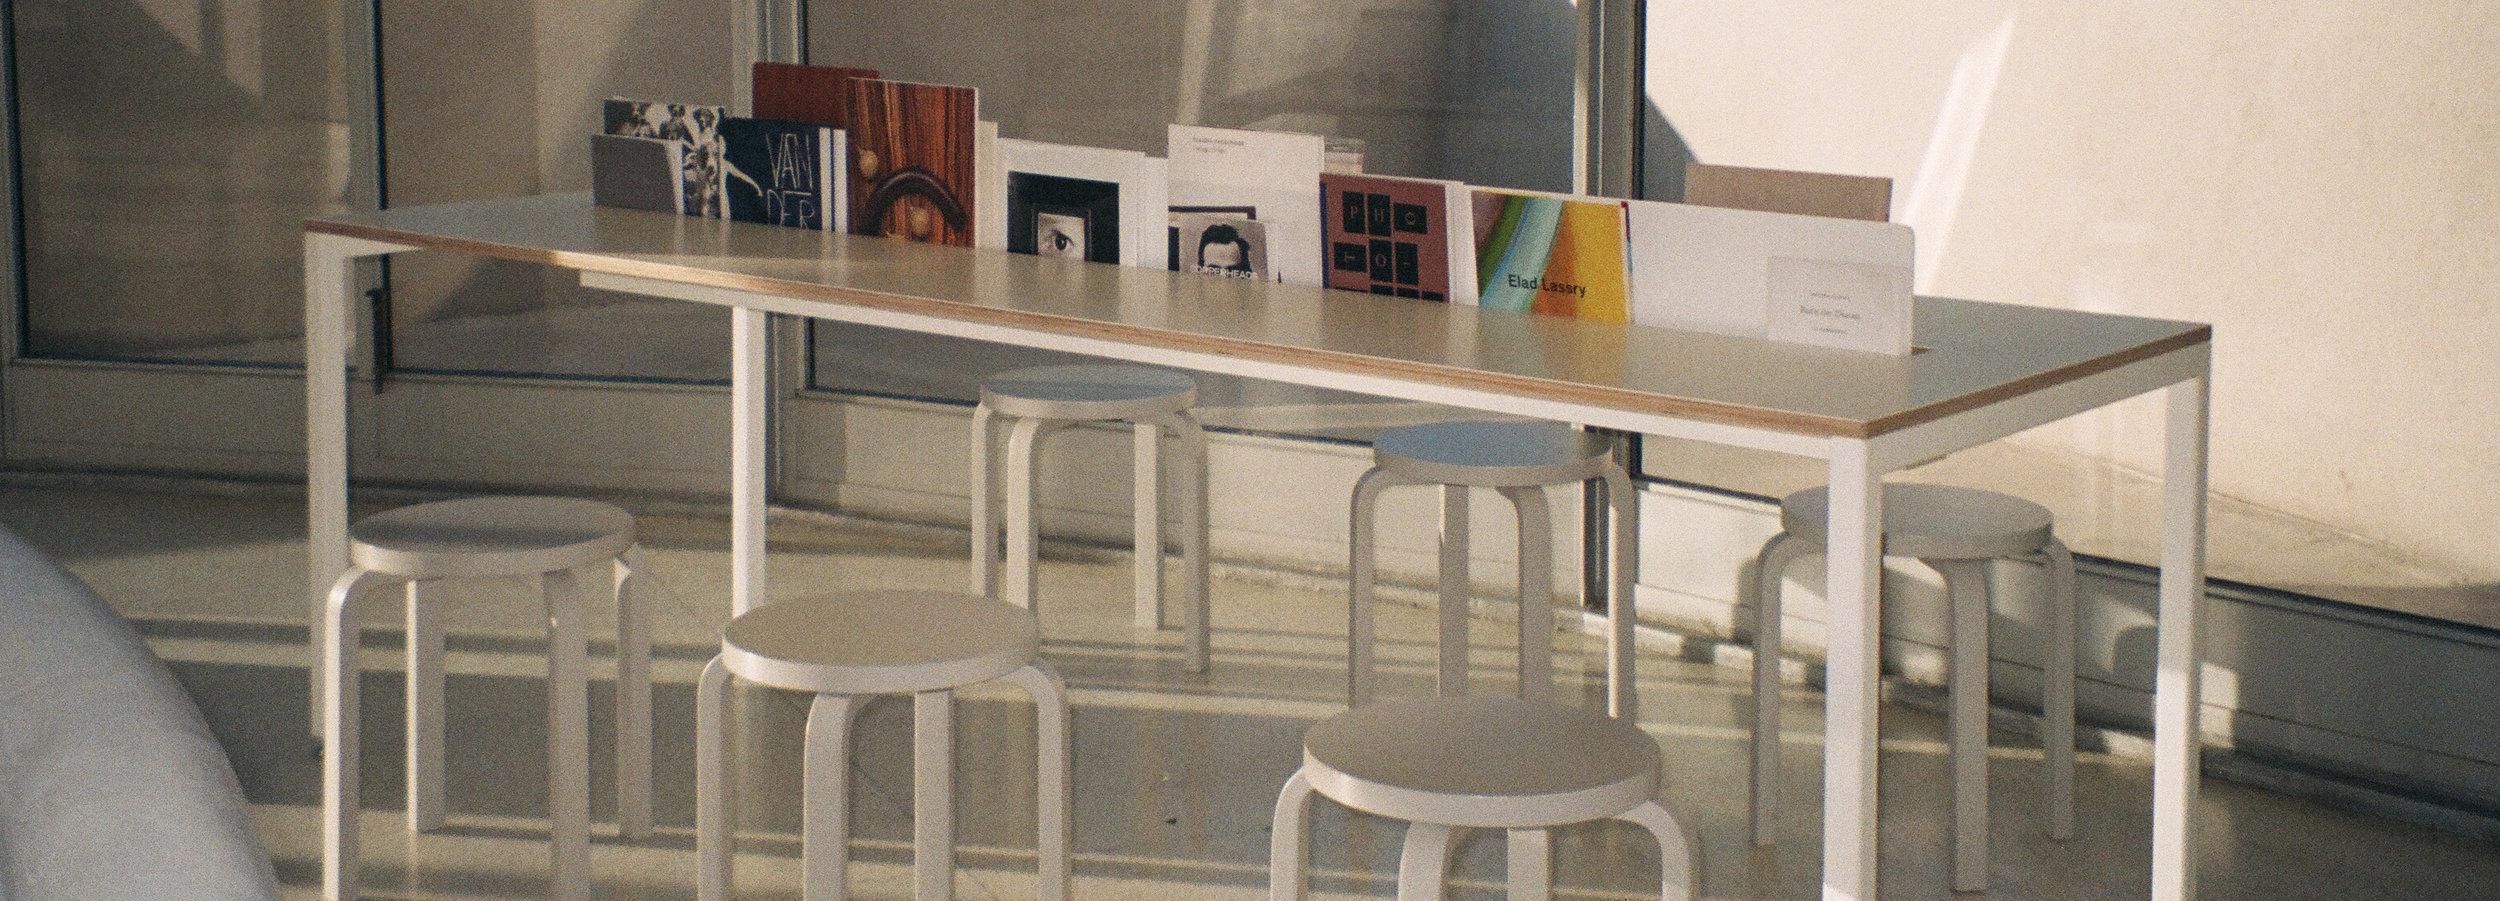 An Interior Of Modernity III